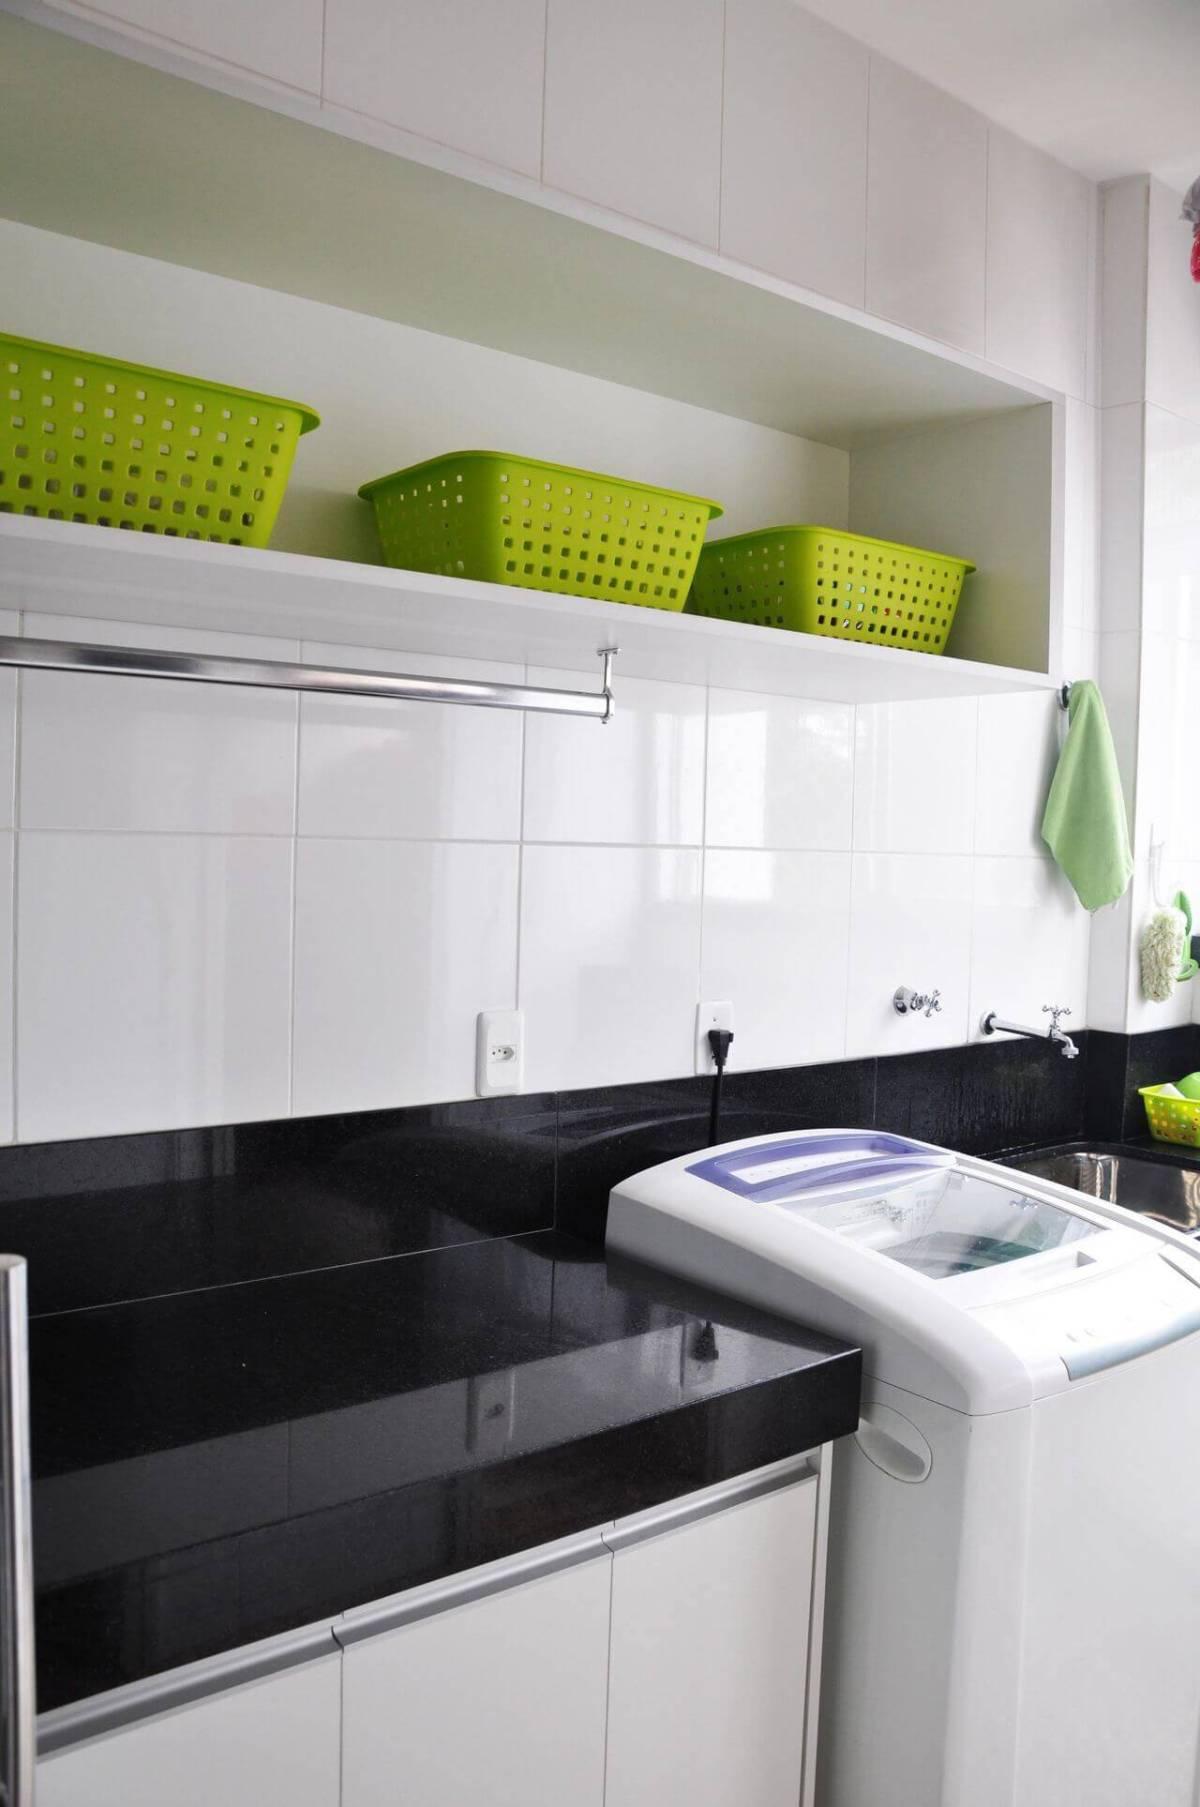 caixa organizadora lavanderia verde isabela basques 30265